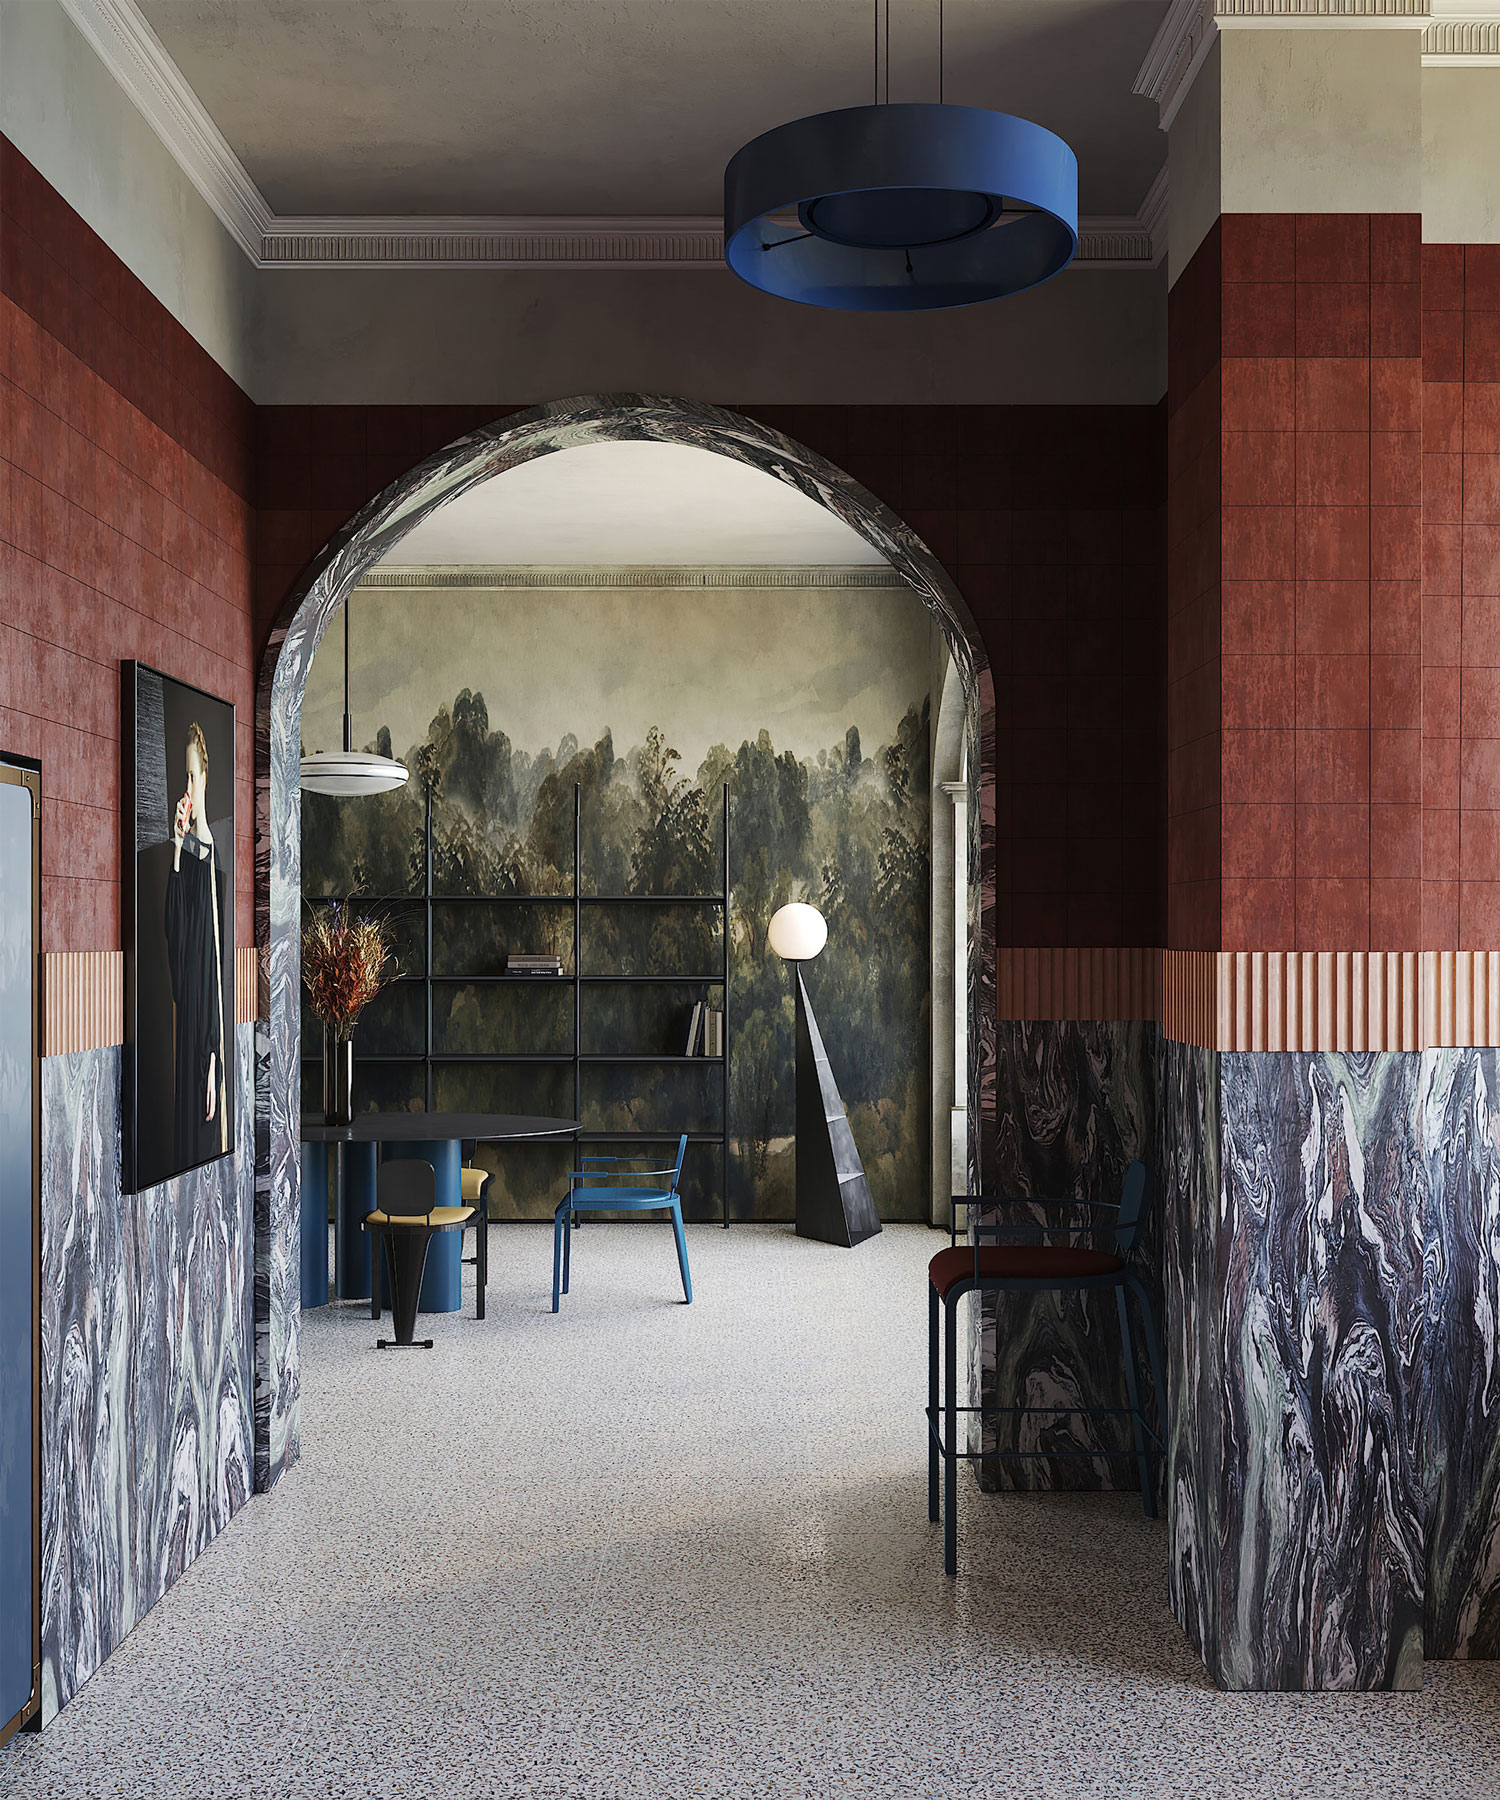 Puntofilipino Memphis Milano Apartament Interiors Photo Polina Parcevskya Yellowtrace 01